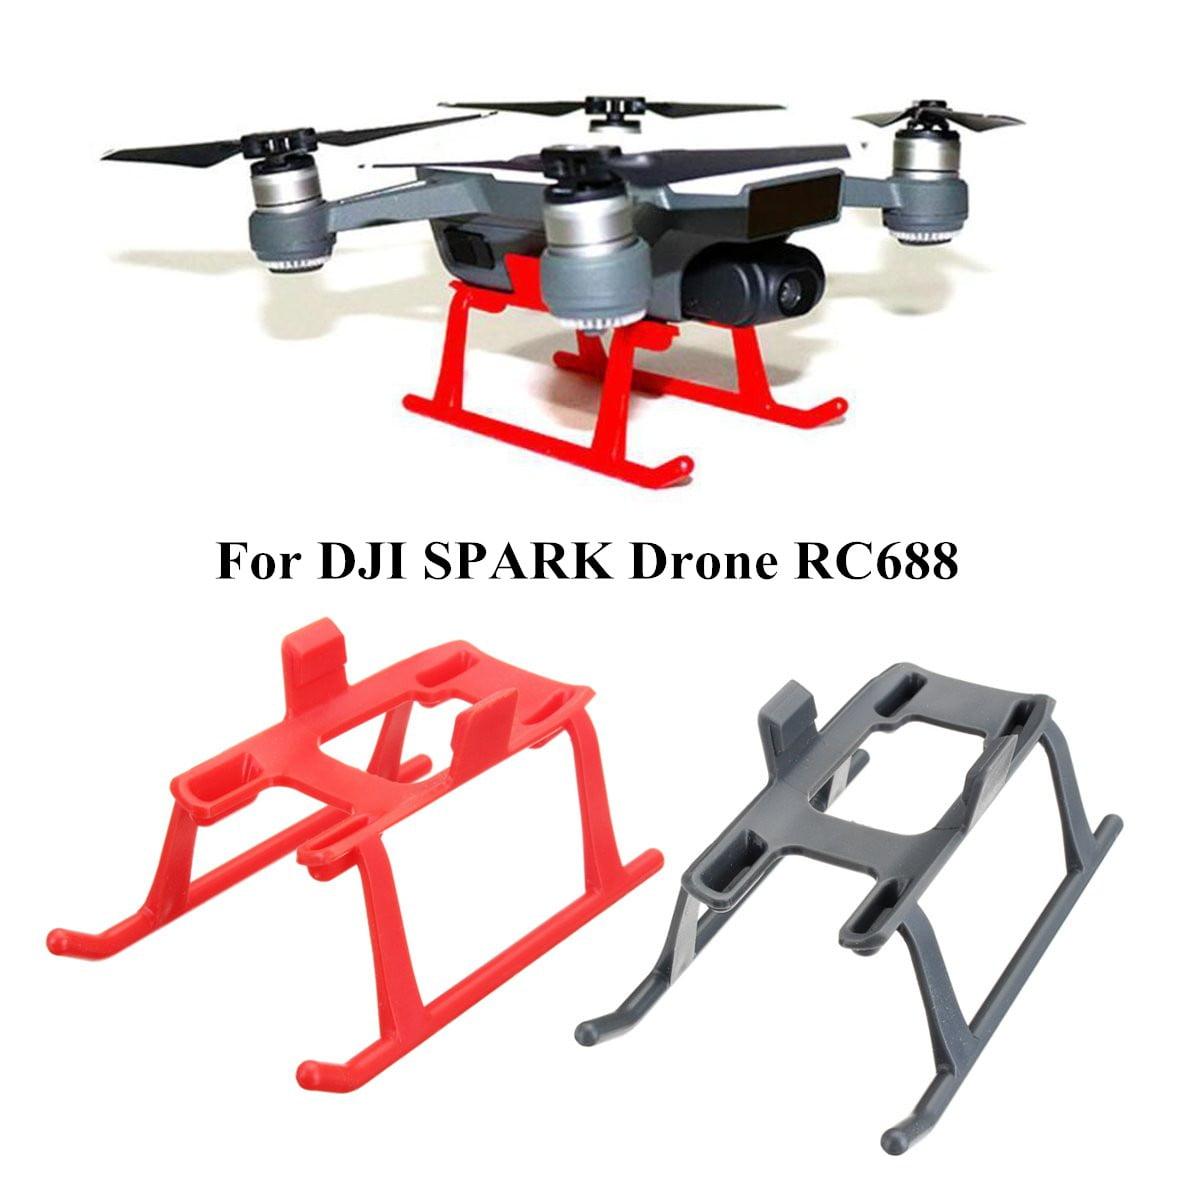 Extend Landing Gear Leg Riser Stabilizer Accessories Fit DJI SPARK Drone RC68 US